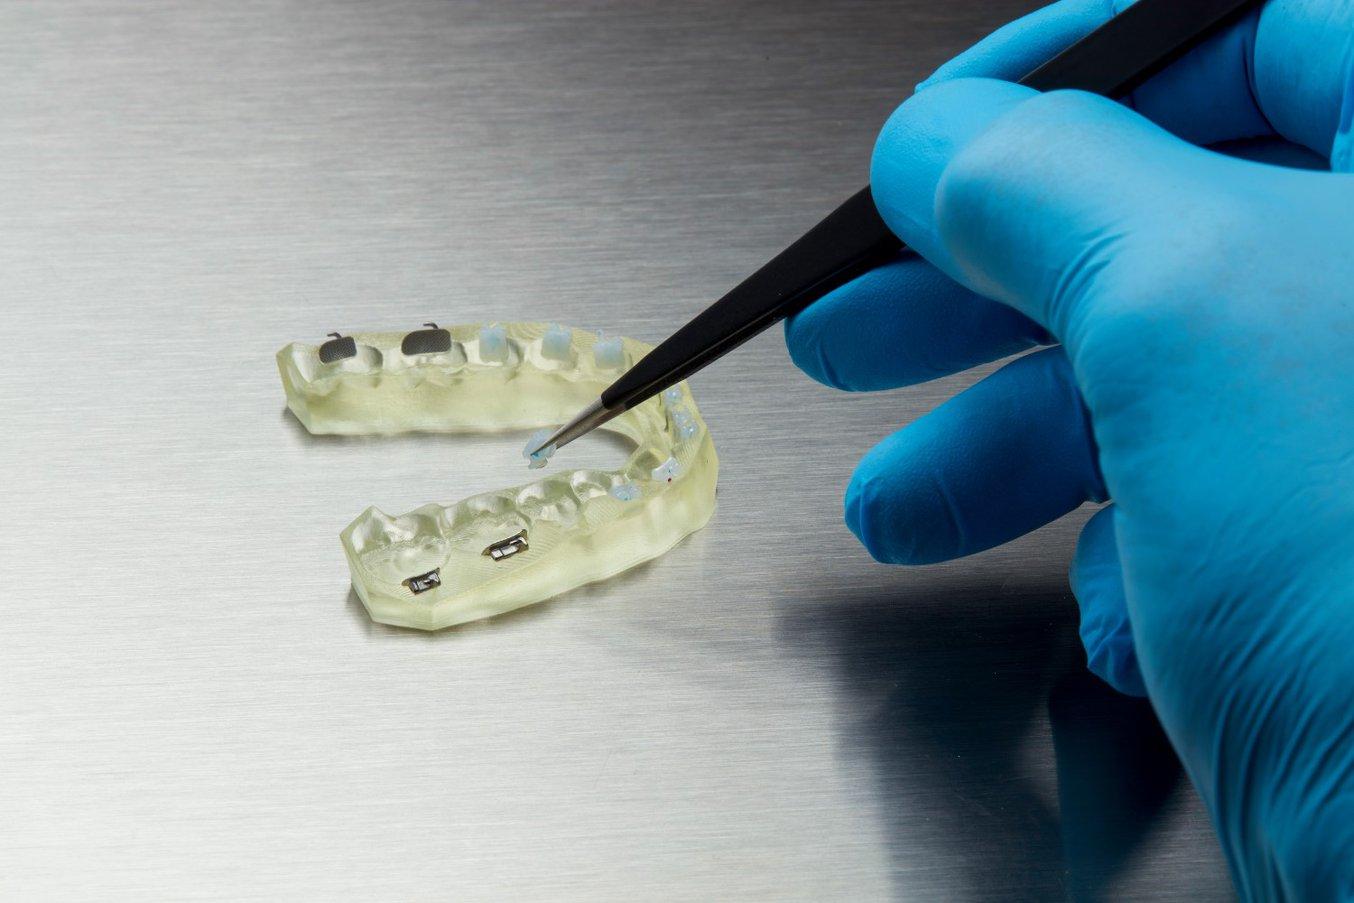 IBT Resin - Indirect Bonding Trays - 3D printing & Application